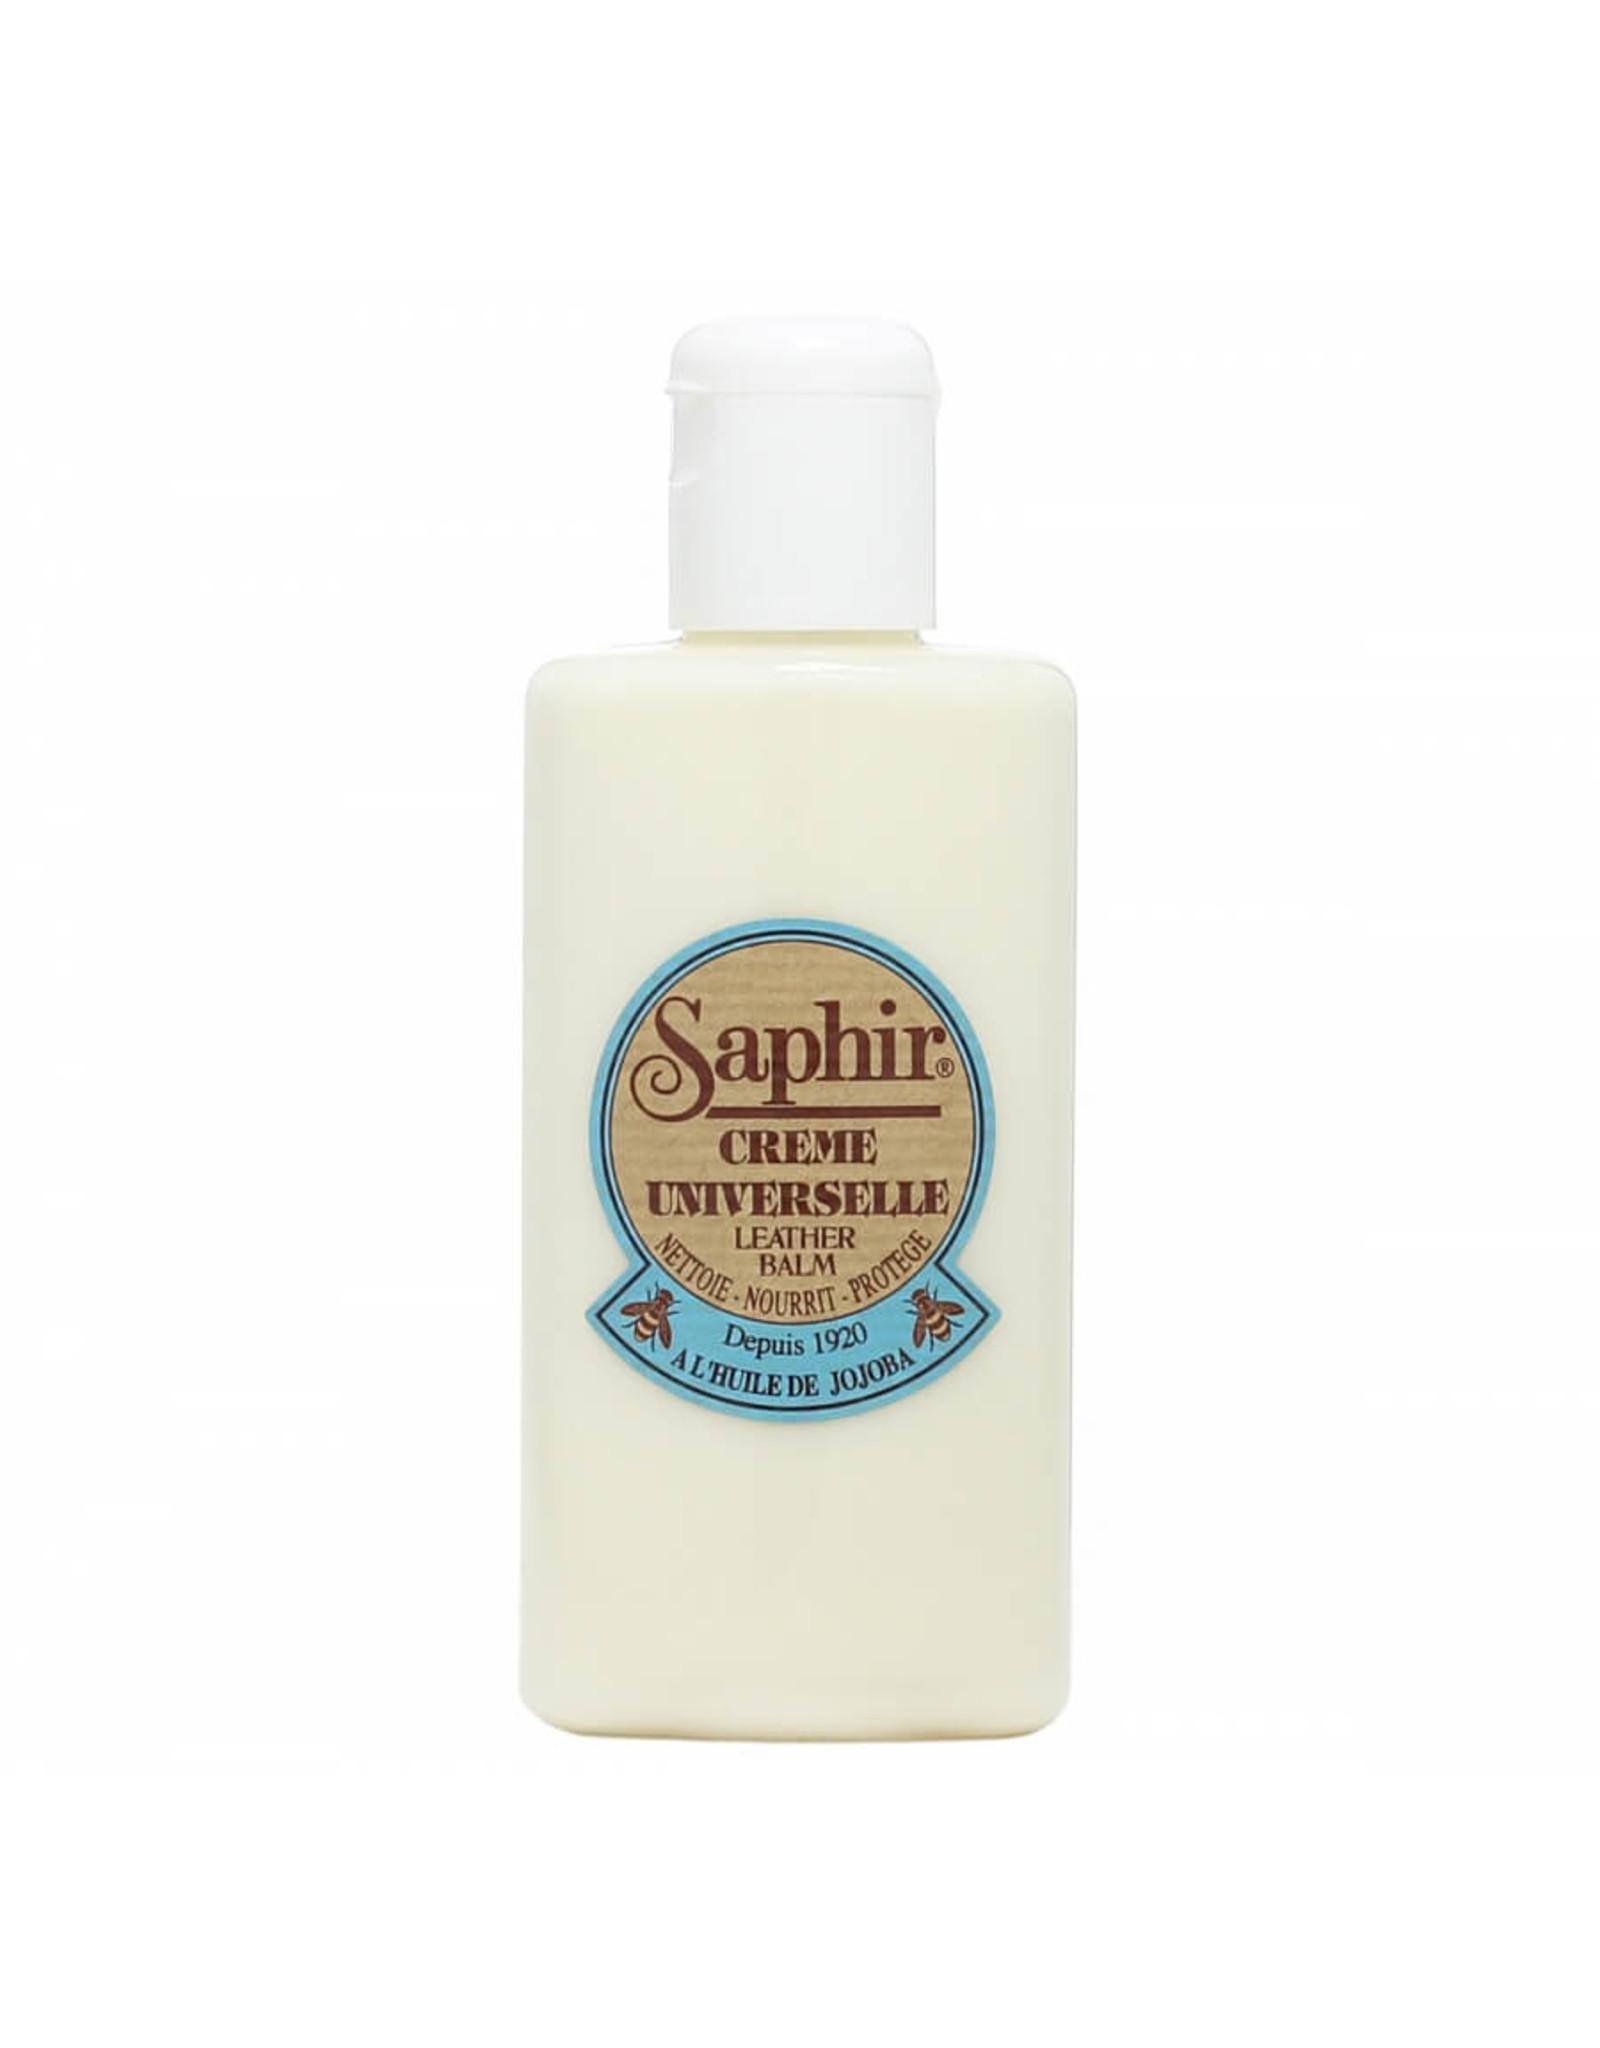 Saphir Universal cream - Leather balm